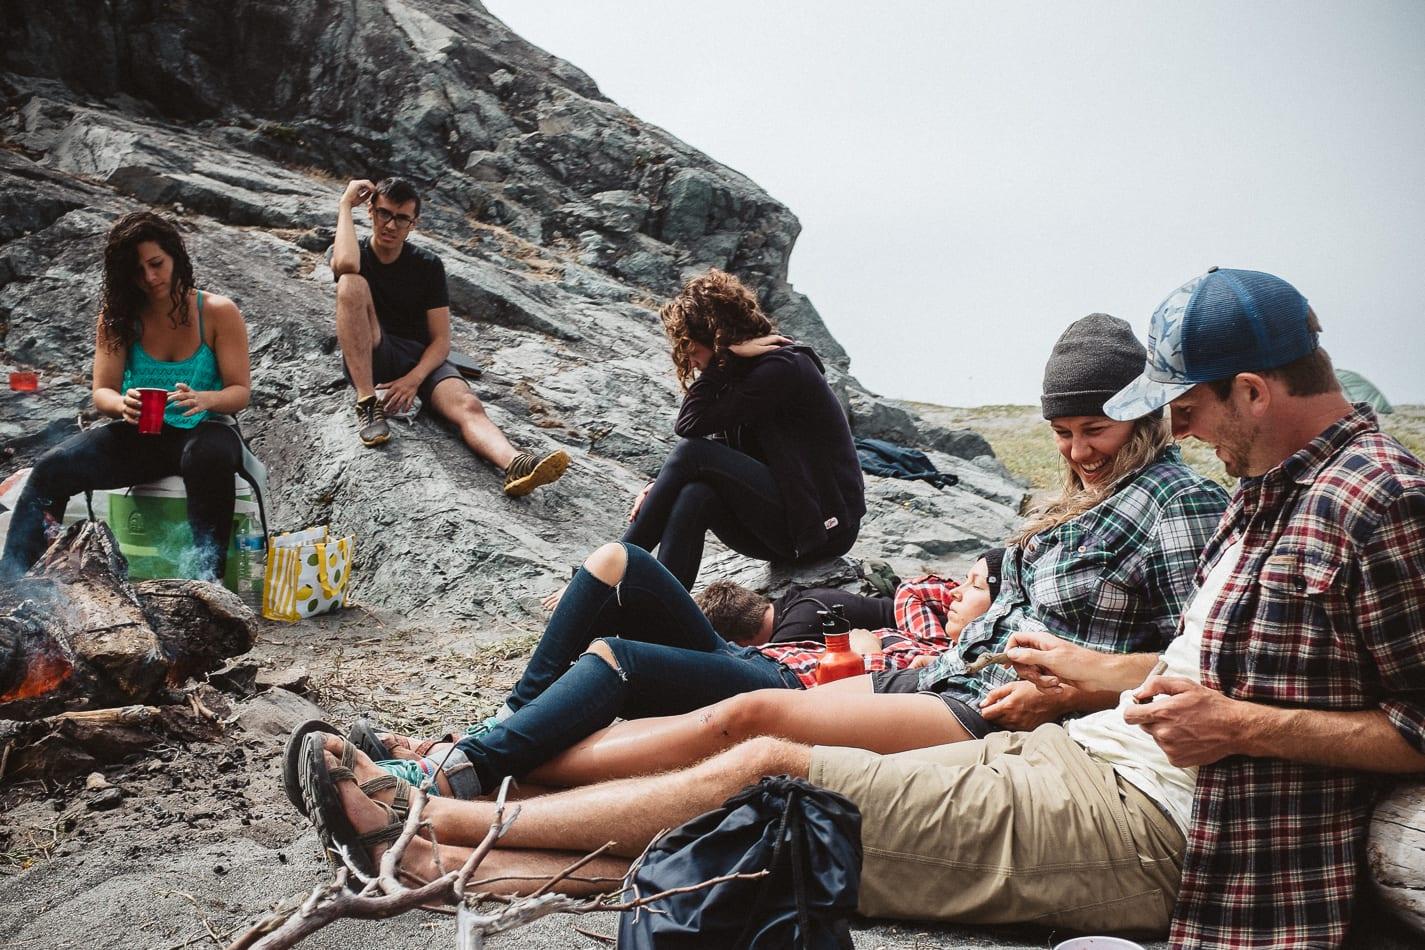 patricks-point-beach-camping-california-adventure-photographer-19